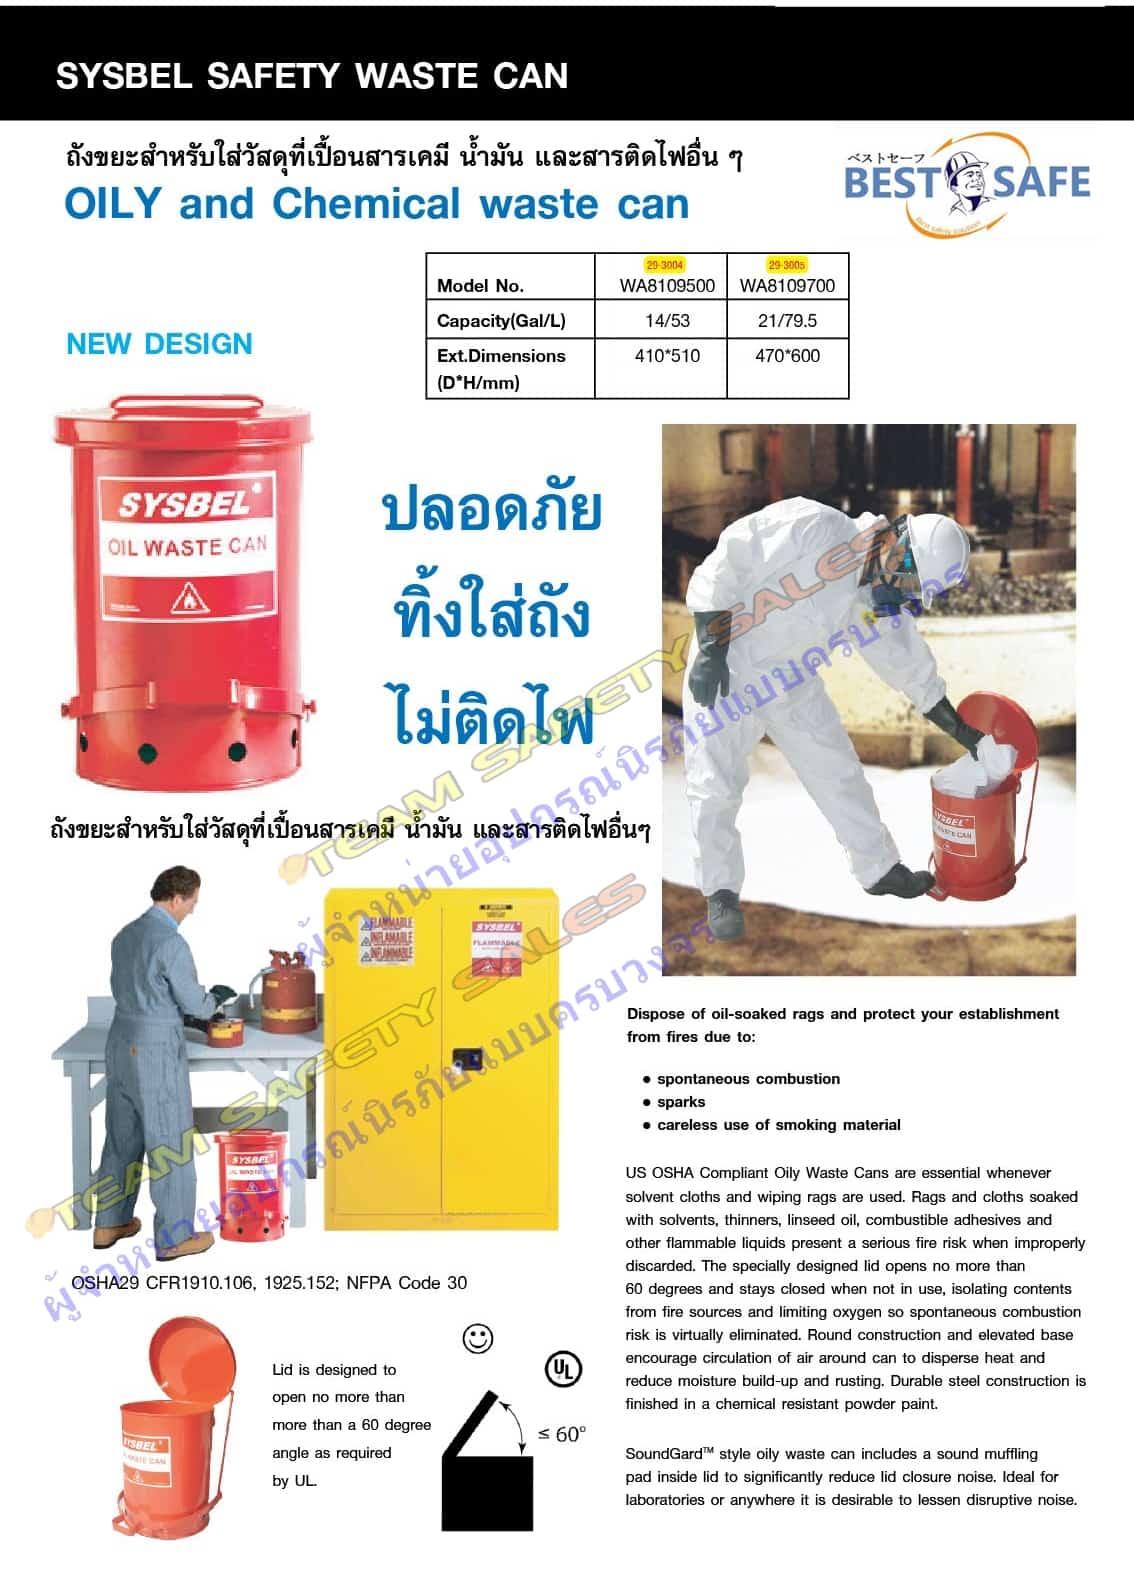 https://www.supersafetythailand.com/wp-content/uploads/2017/05/Sec29-p1-2-safety-waste-can-Copy.jpg